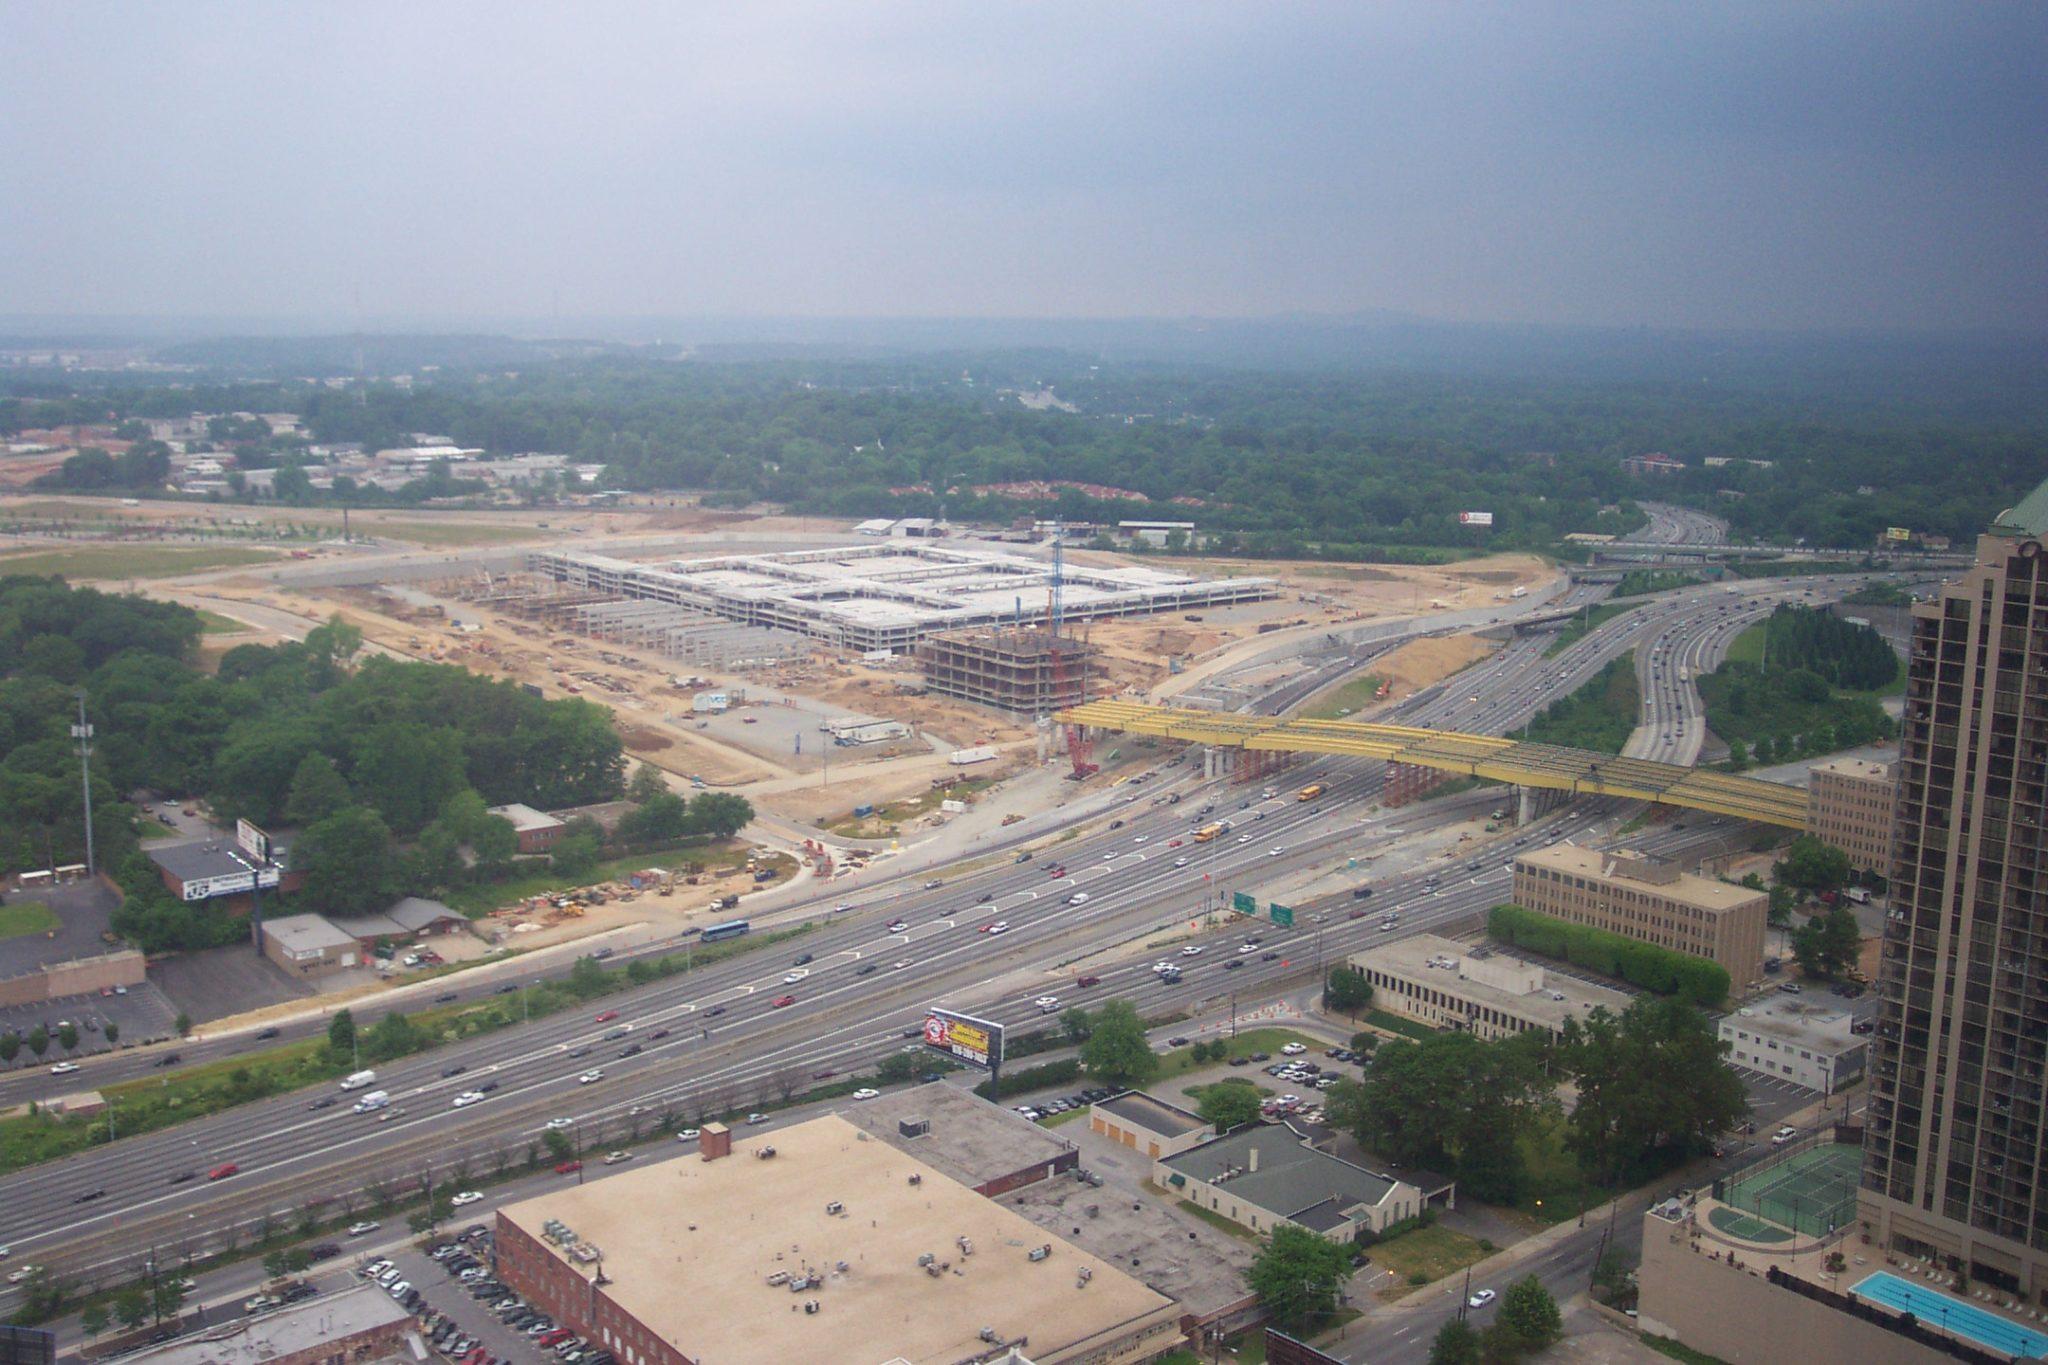 Atlantic Station being built in Atlanta 2003